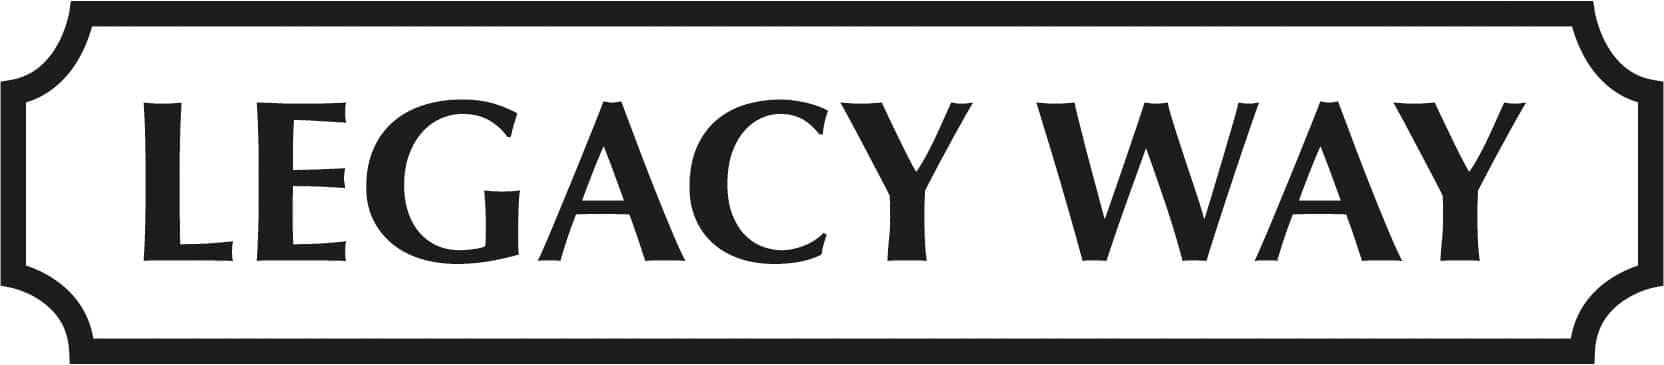 Legacy Way